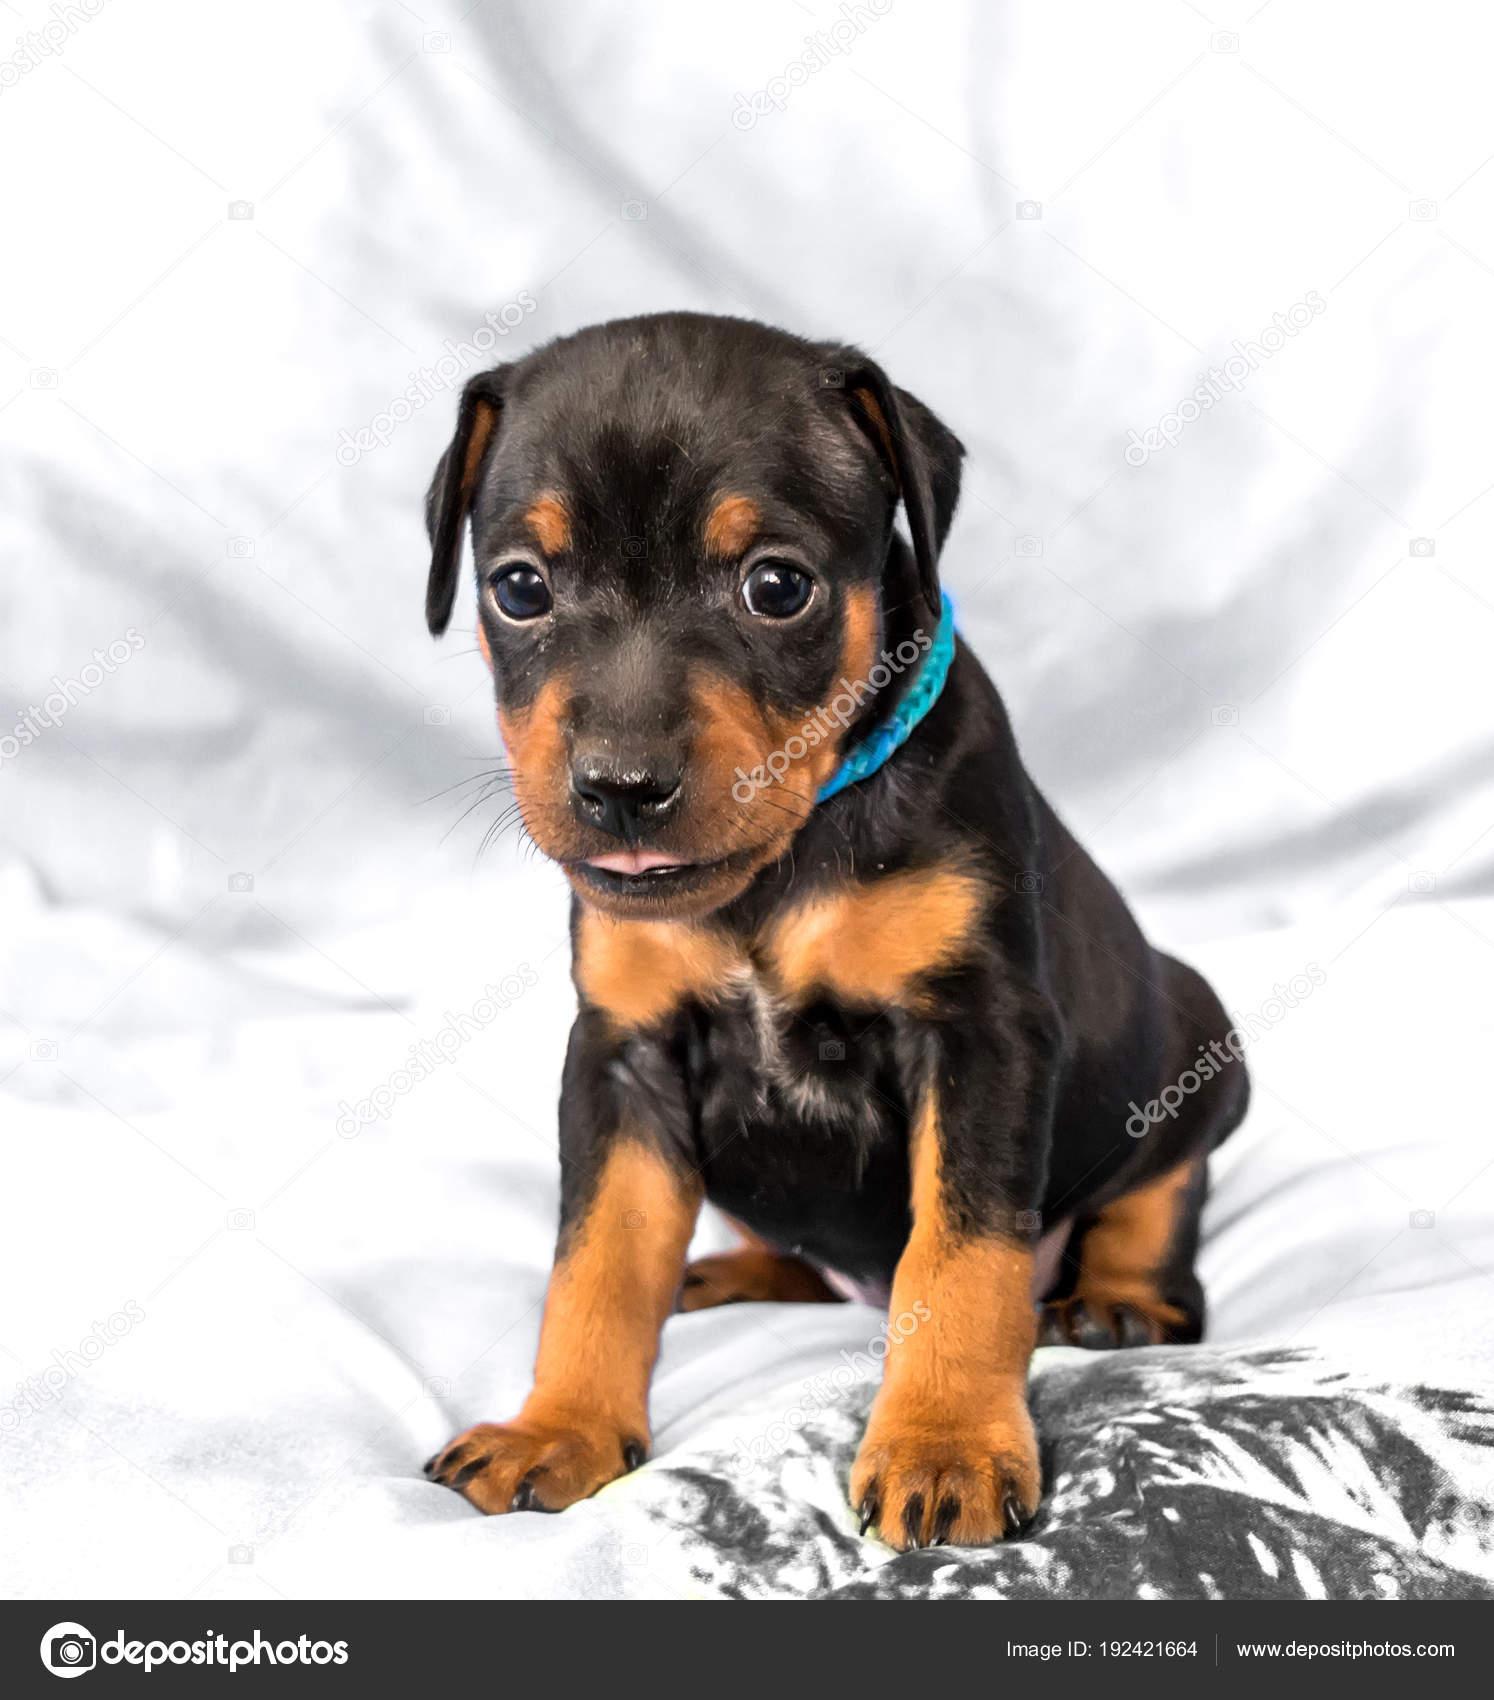 The Miniature Pinscher Puppy 1 Month Old Stock Photo C Lmaximova